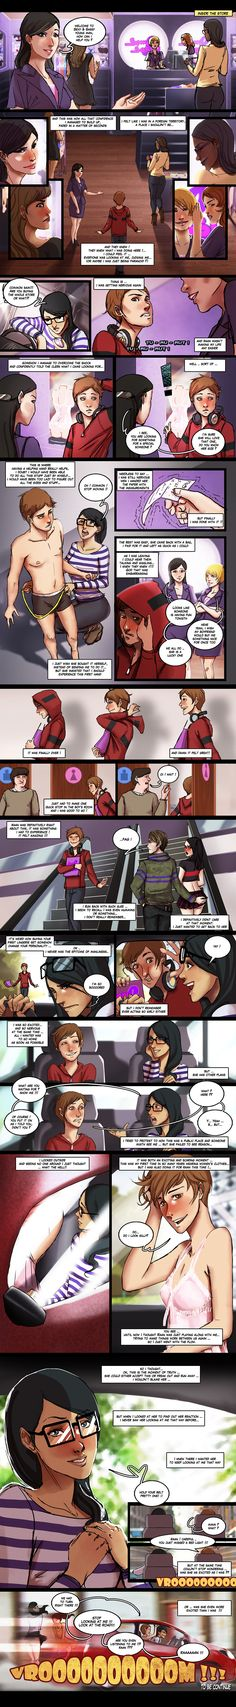 Комиксы feminization 65909 фотография